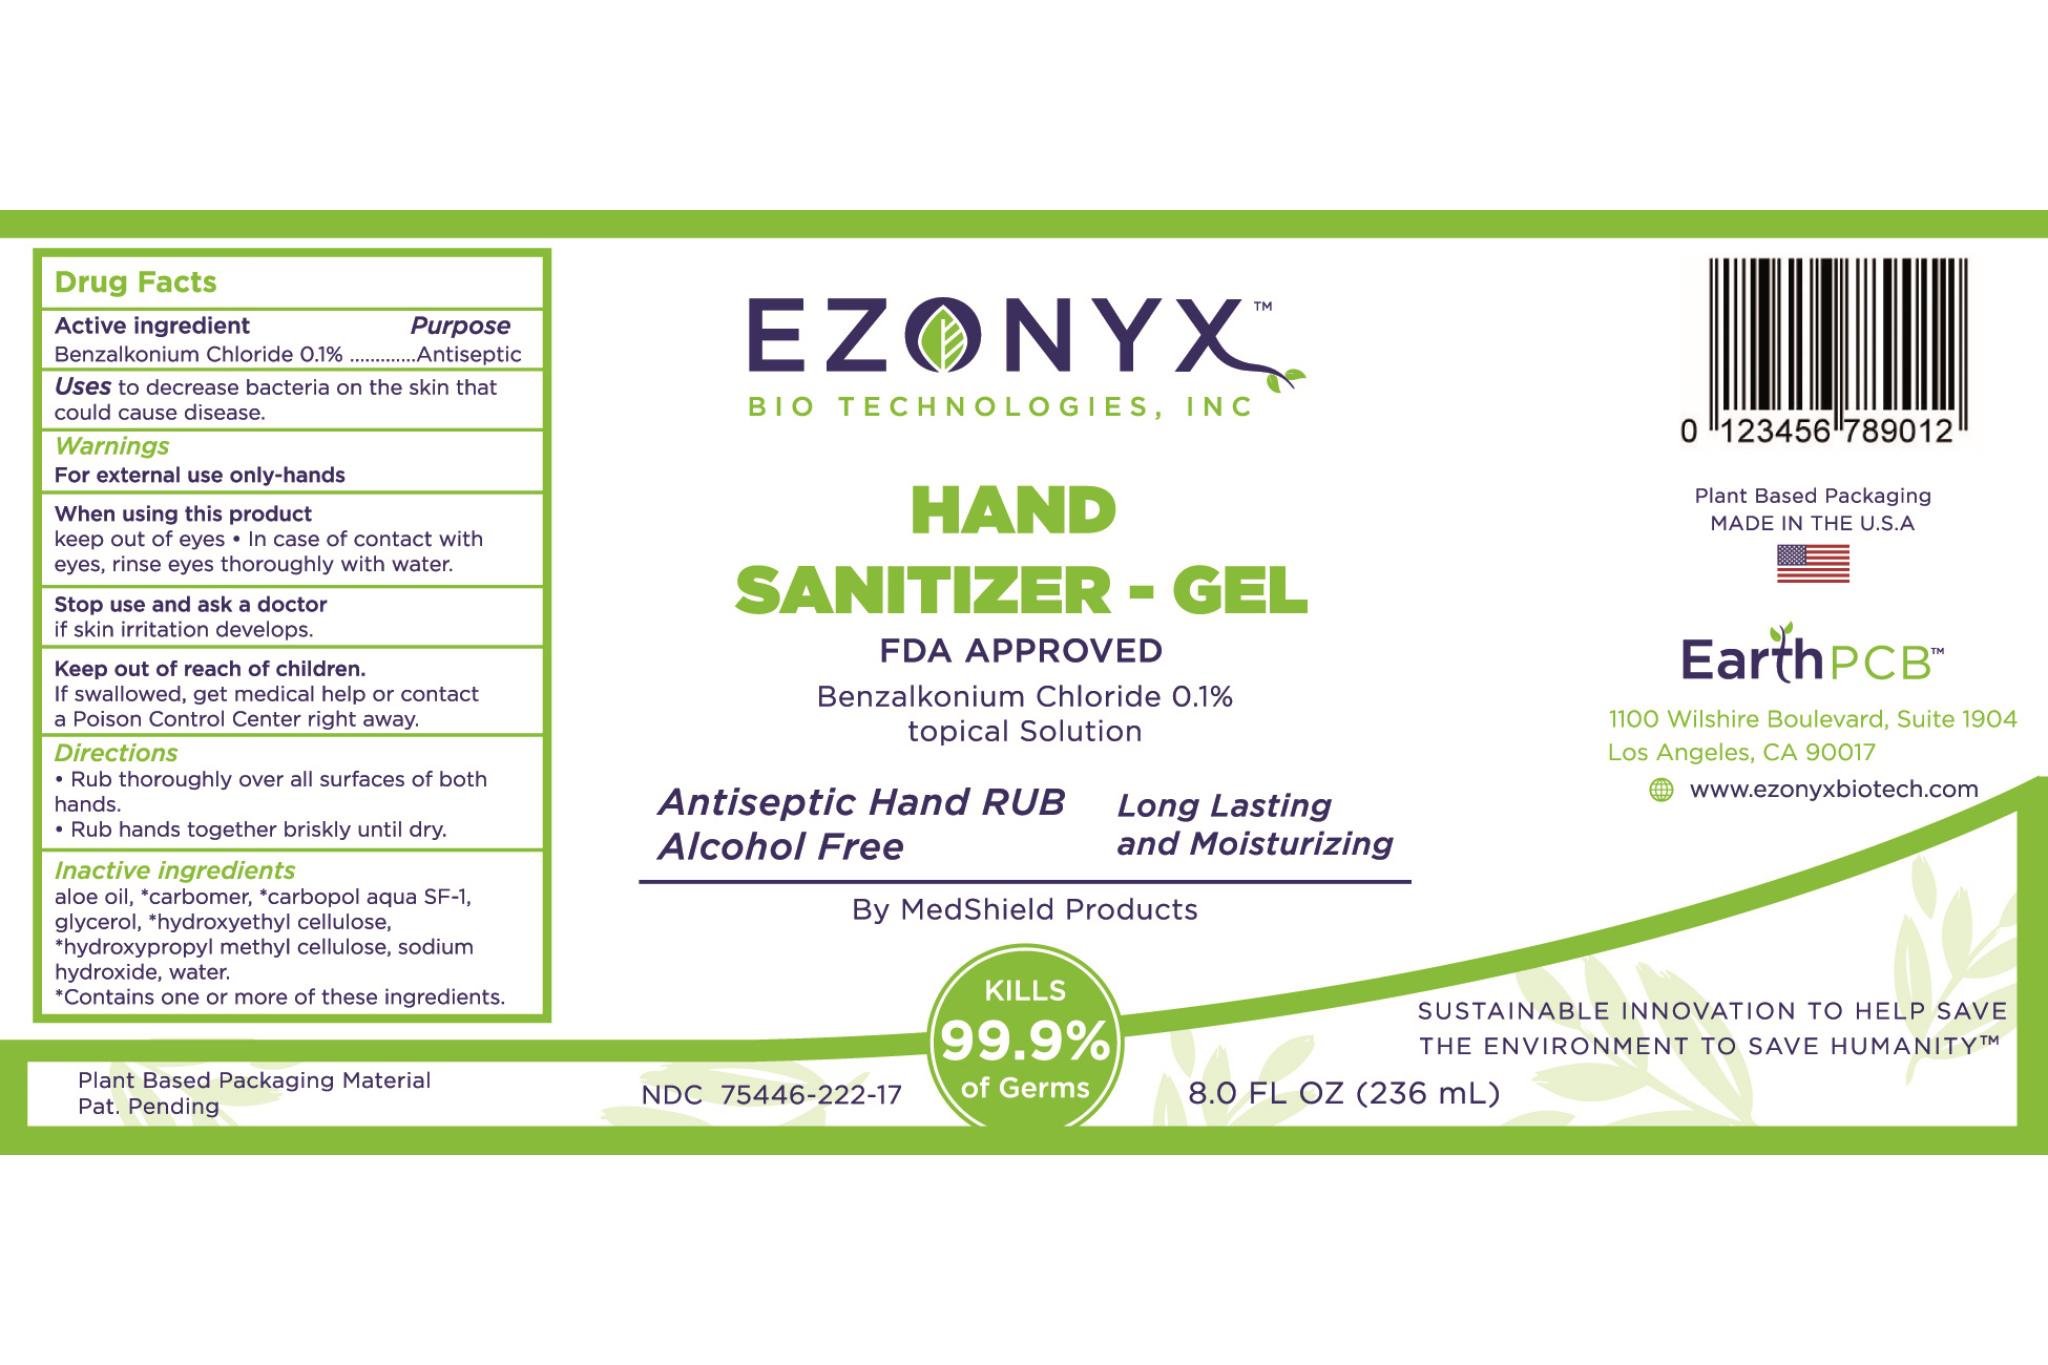 EZONYX Hand Sanitizer Gel (Alcohol Free)